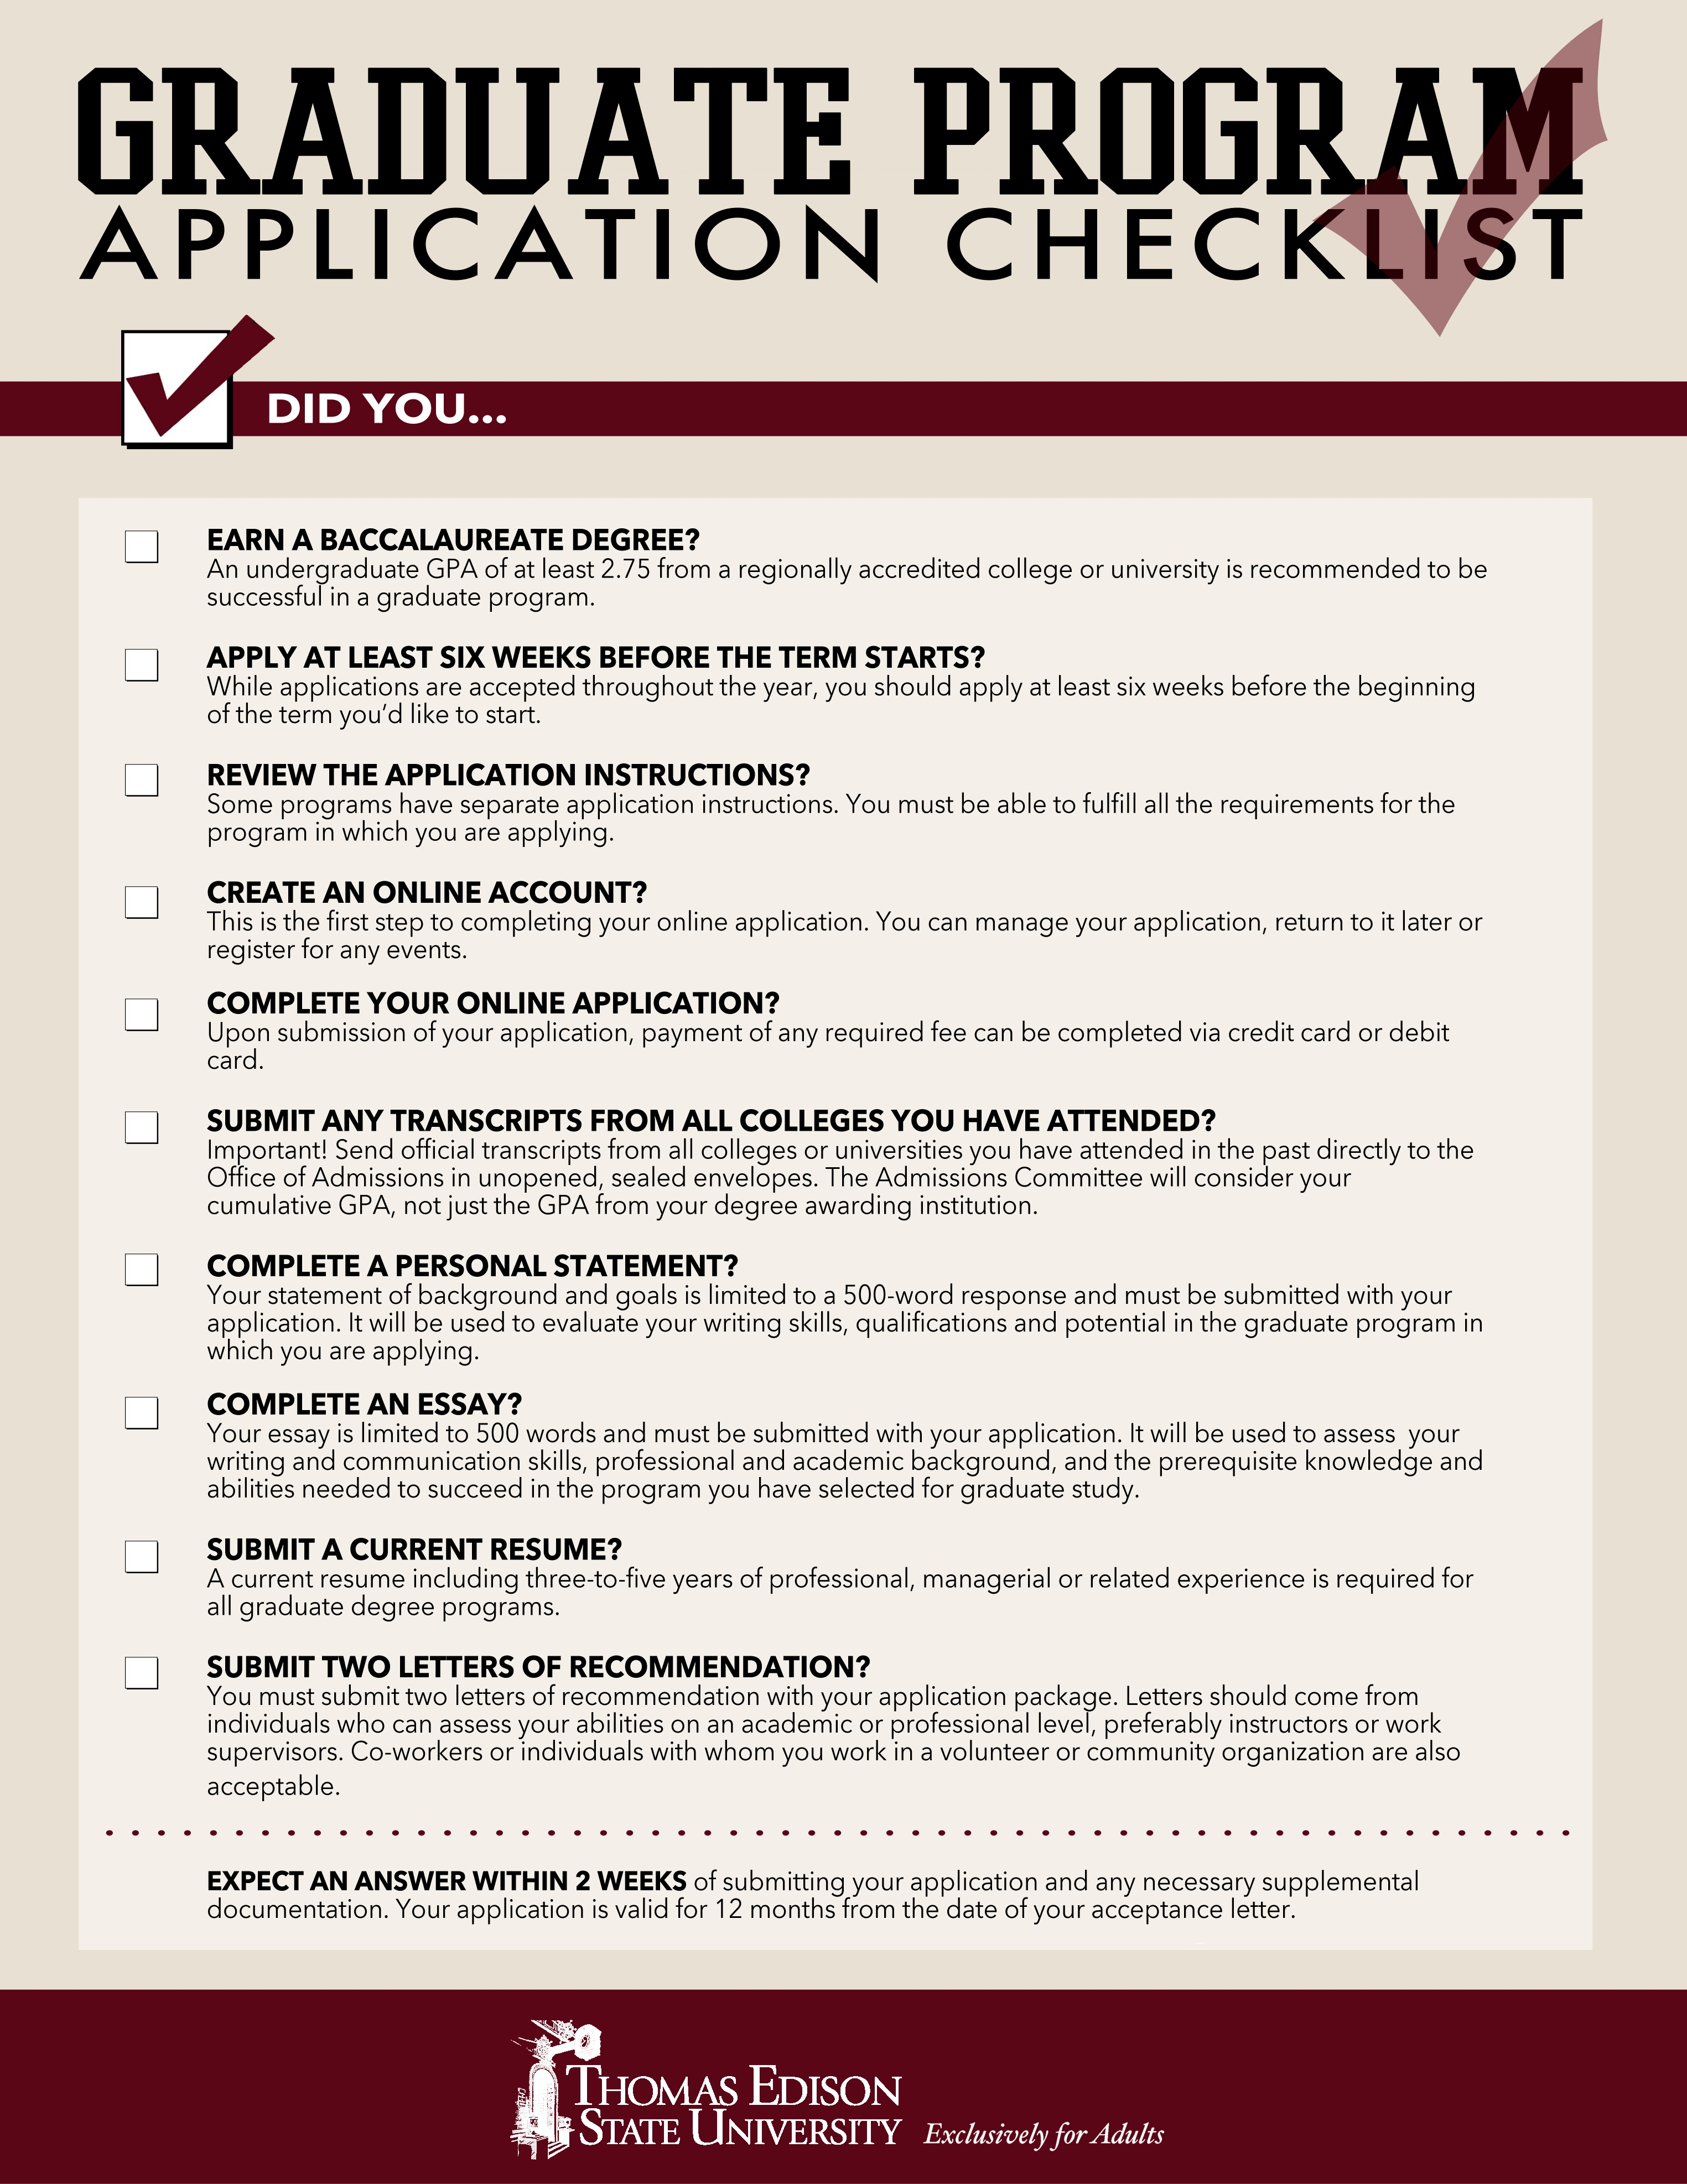 Thomas_Edison_State_University_graduate_application_checklist